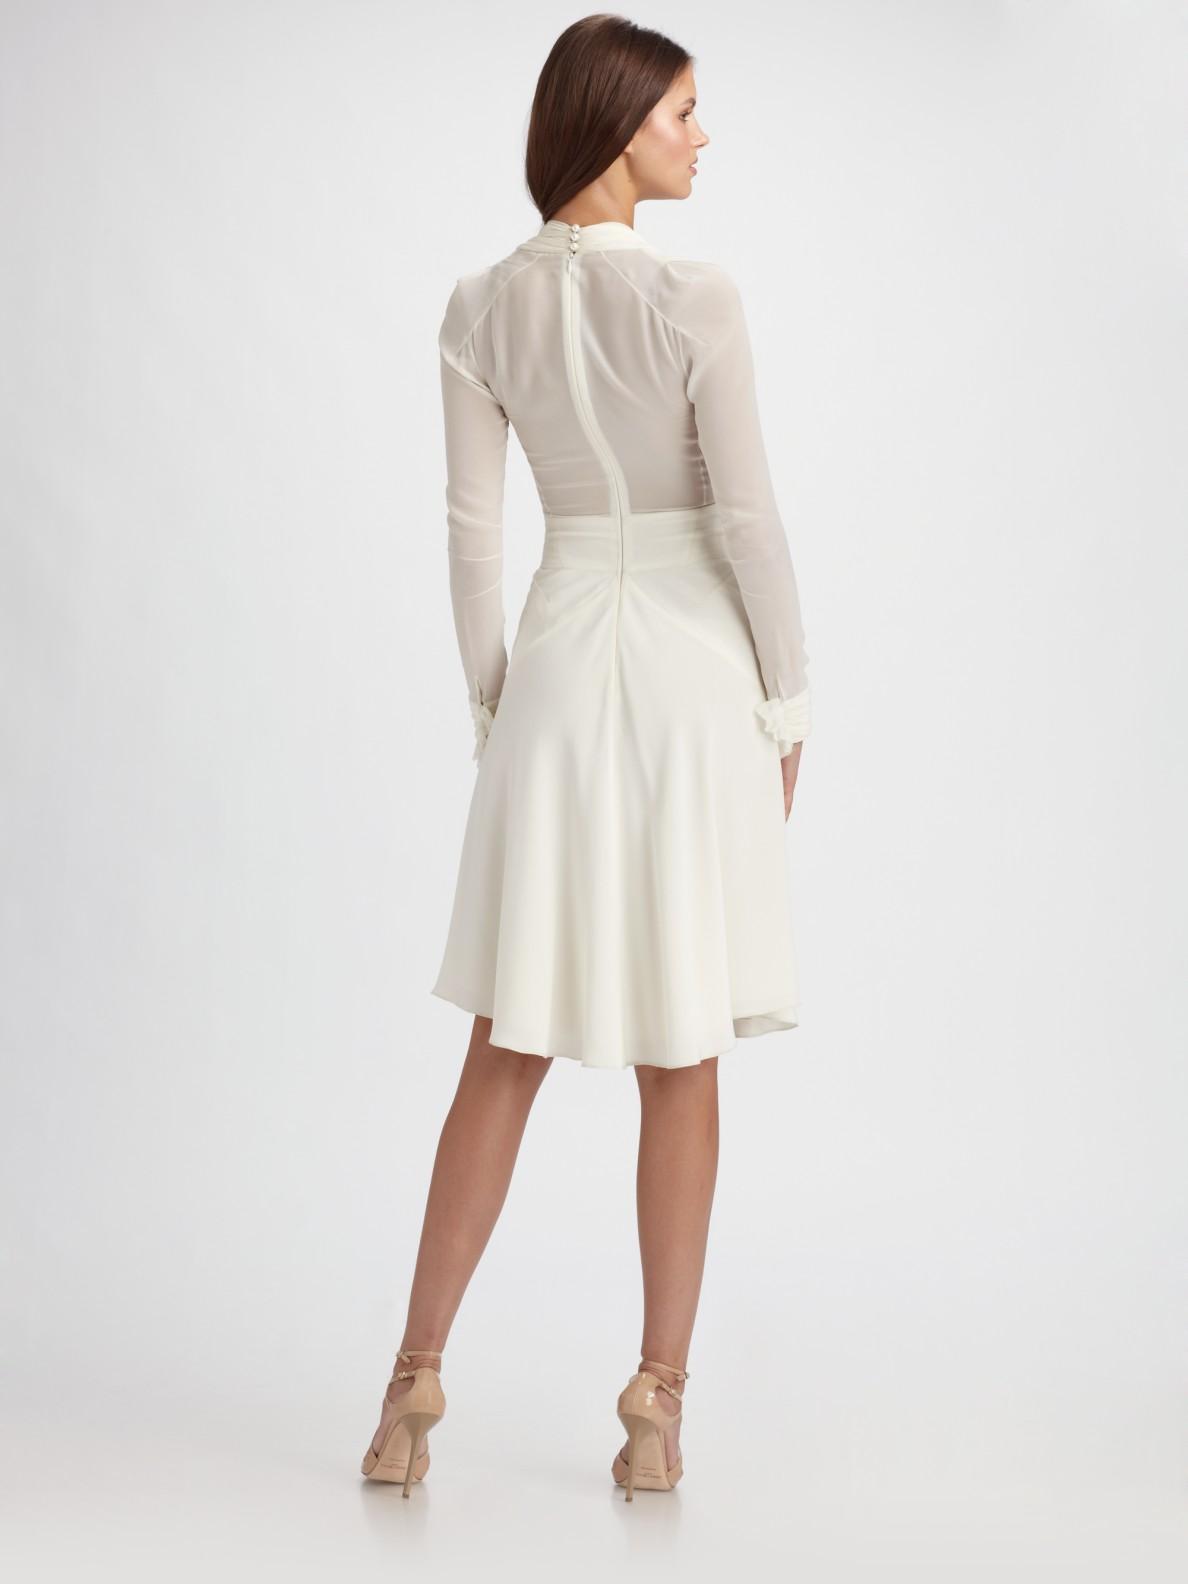 Zac posen Crepe & Chiffon Long Sleeve Dress in White